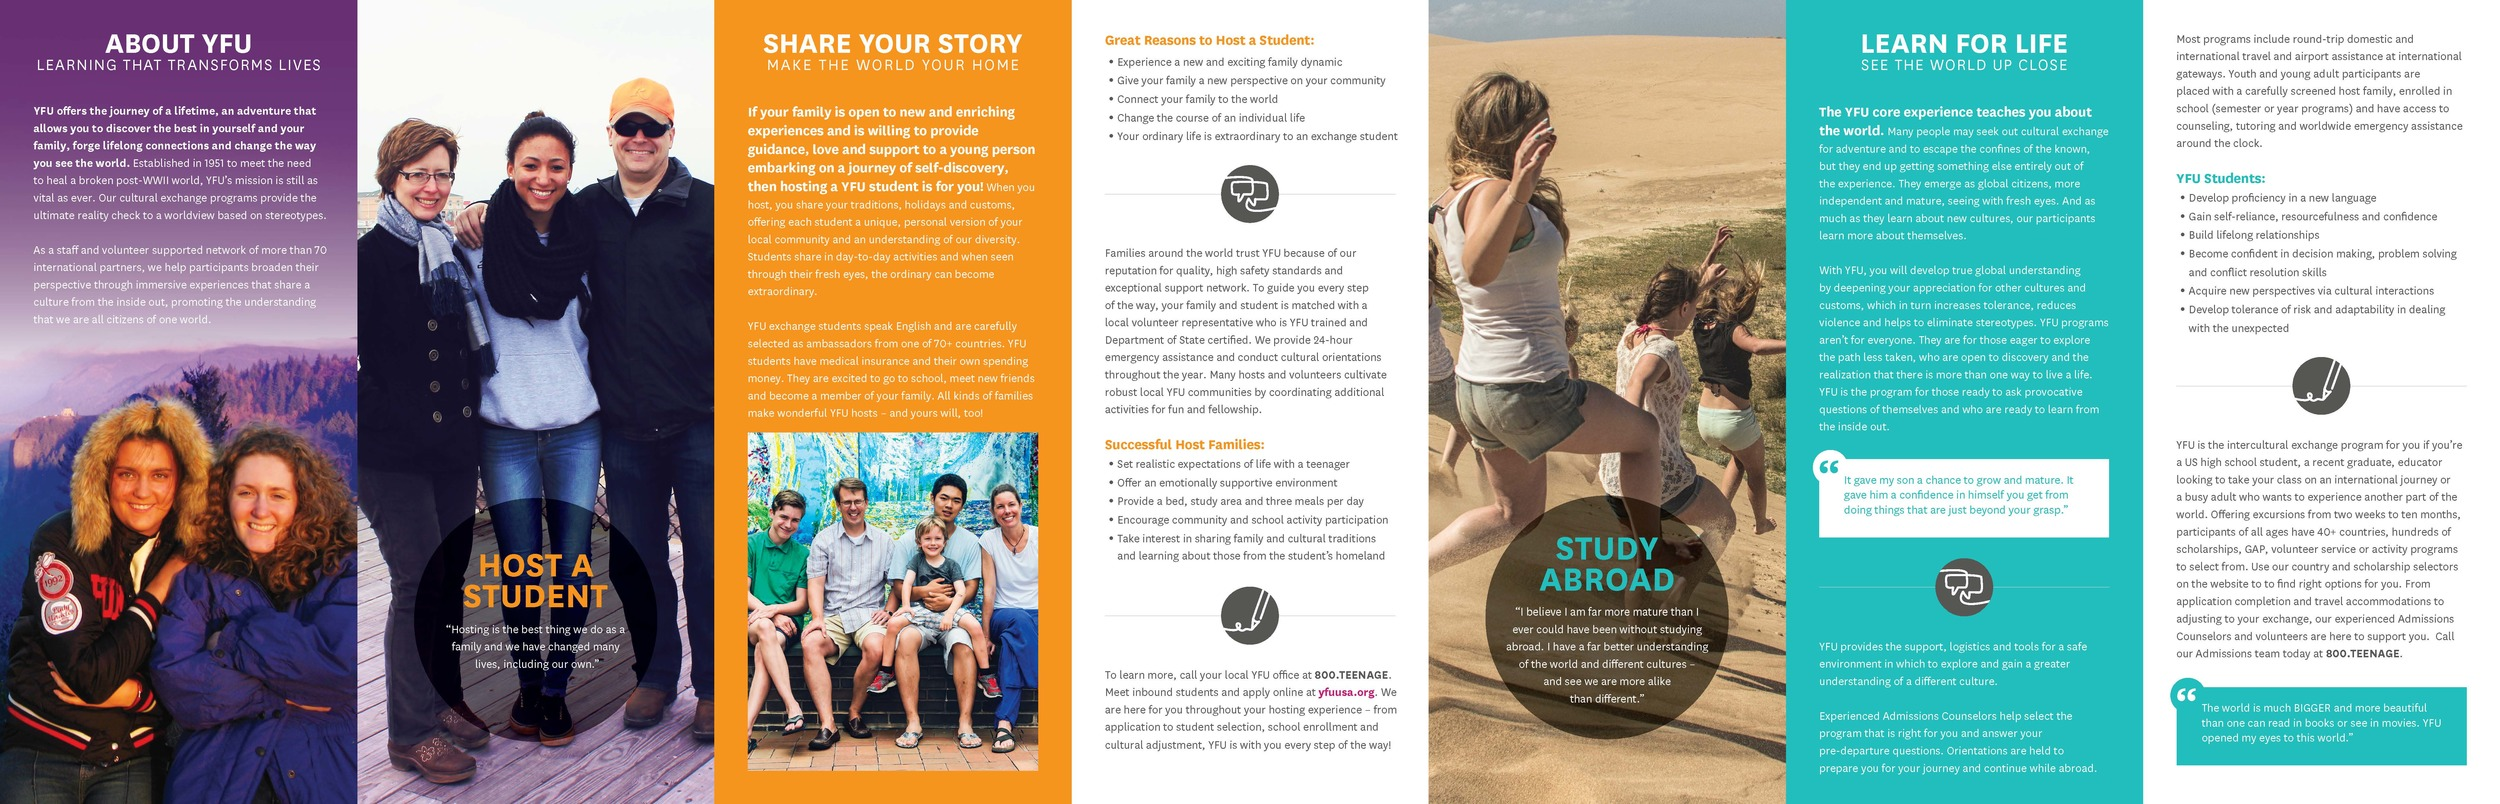 brochure2015_spread.jpg